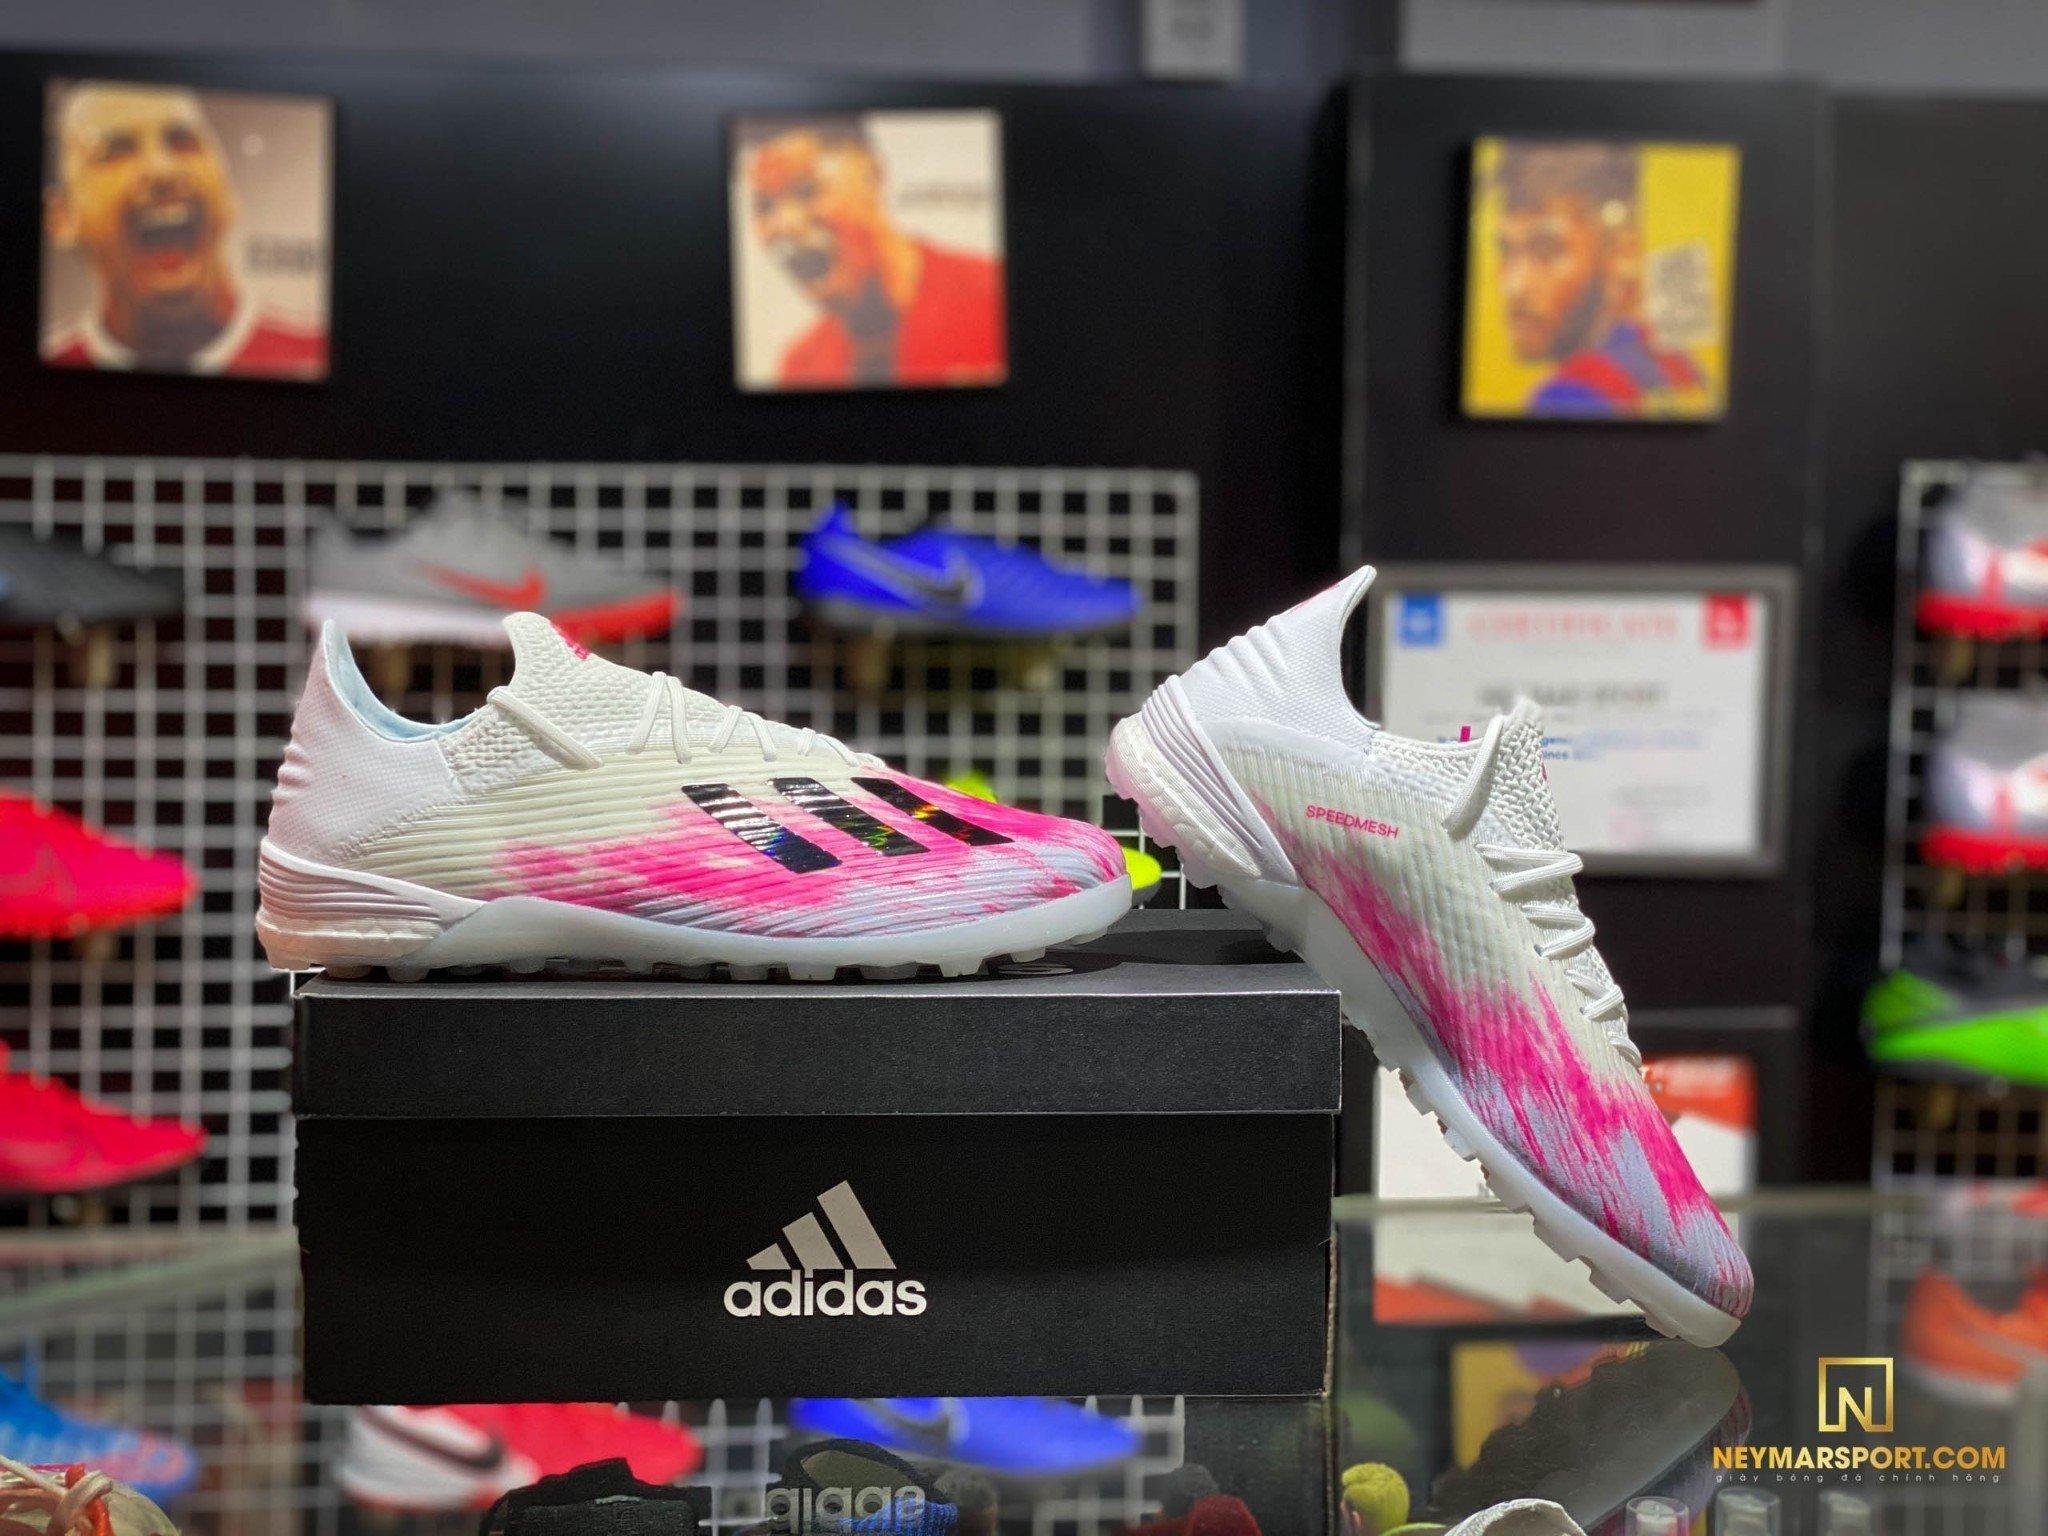 Giày đá bóng adidas X 19.1 TF Uniforia